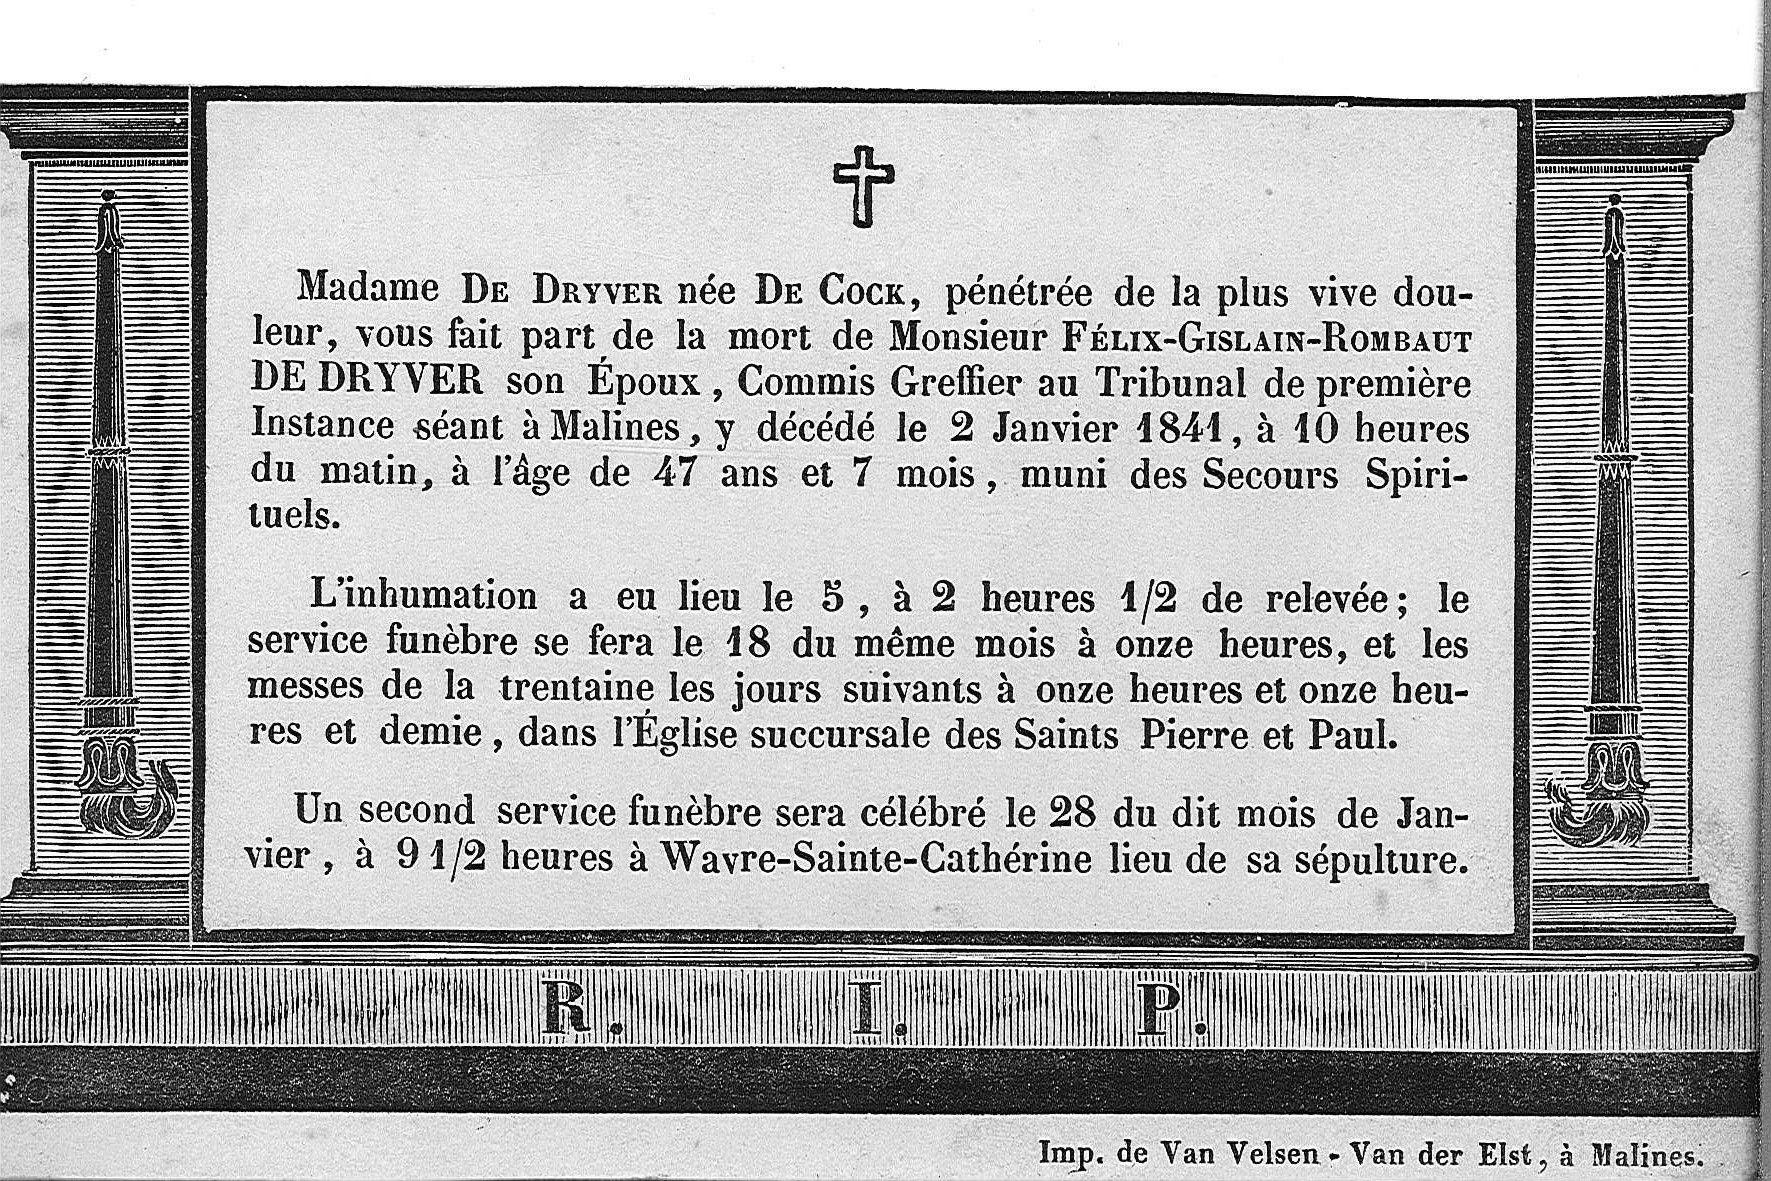 Félix-Gislain-Rombaut-(1841)-20120817110443_00067.jpg